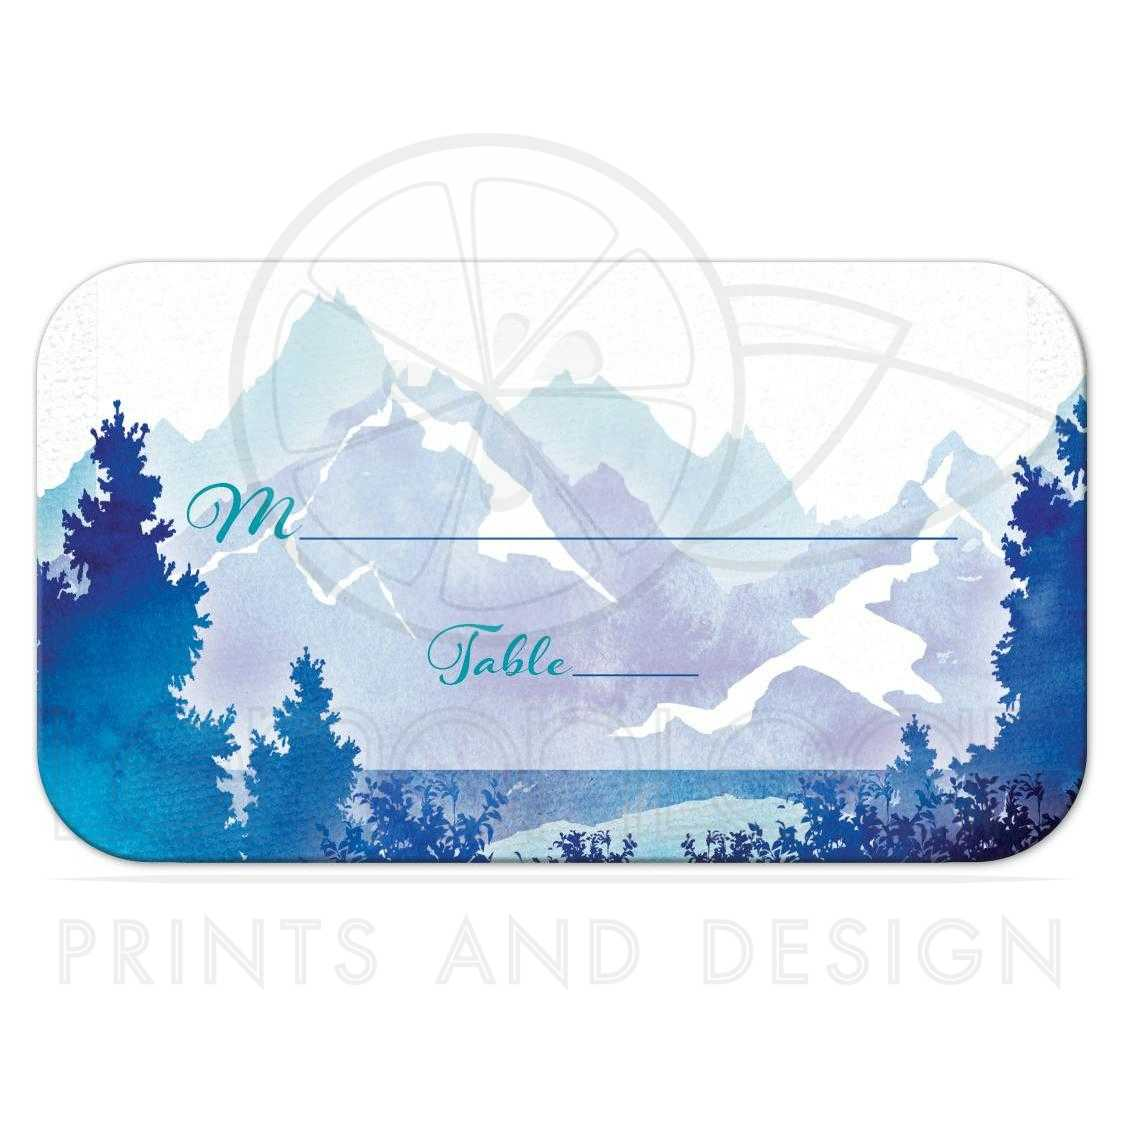 sky name card Printable blue watercolor escort card calligraphy place card ocean blue wedding name card printable ocean place card